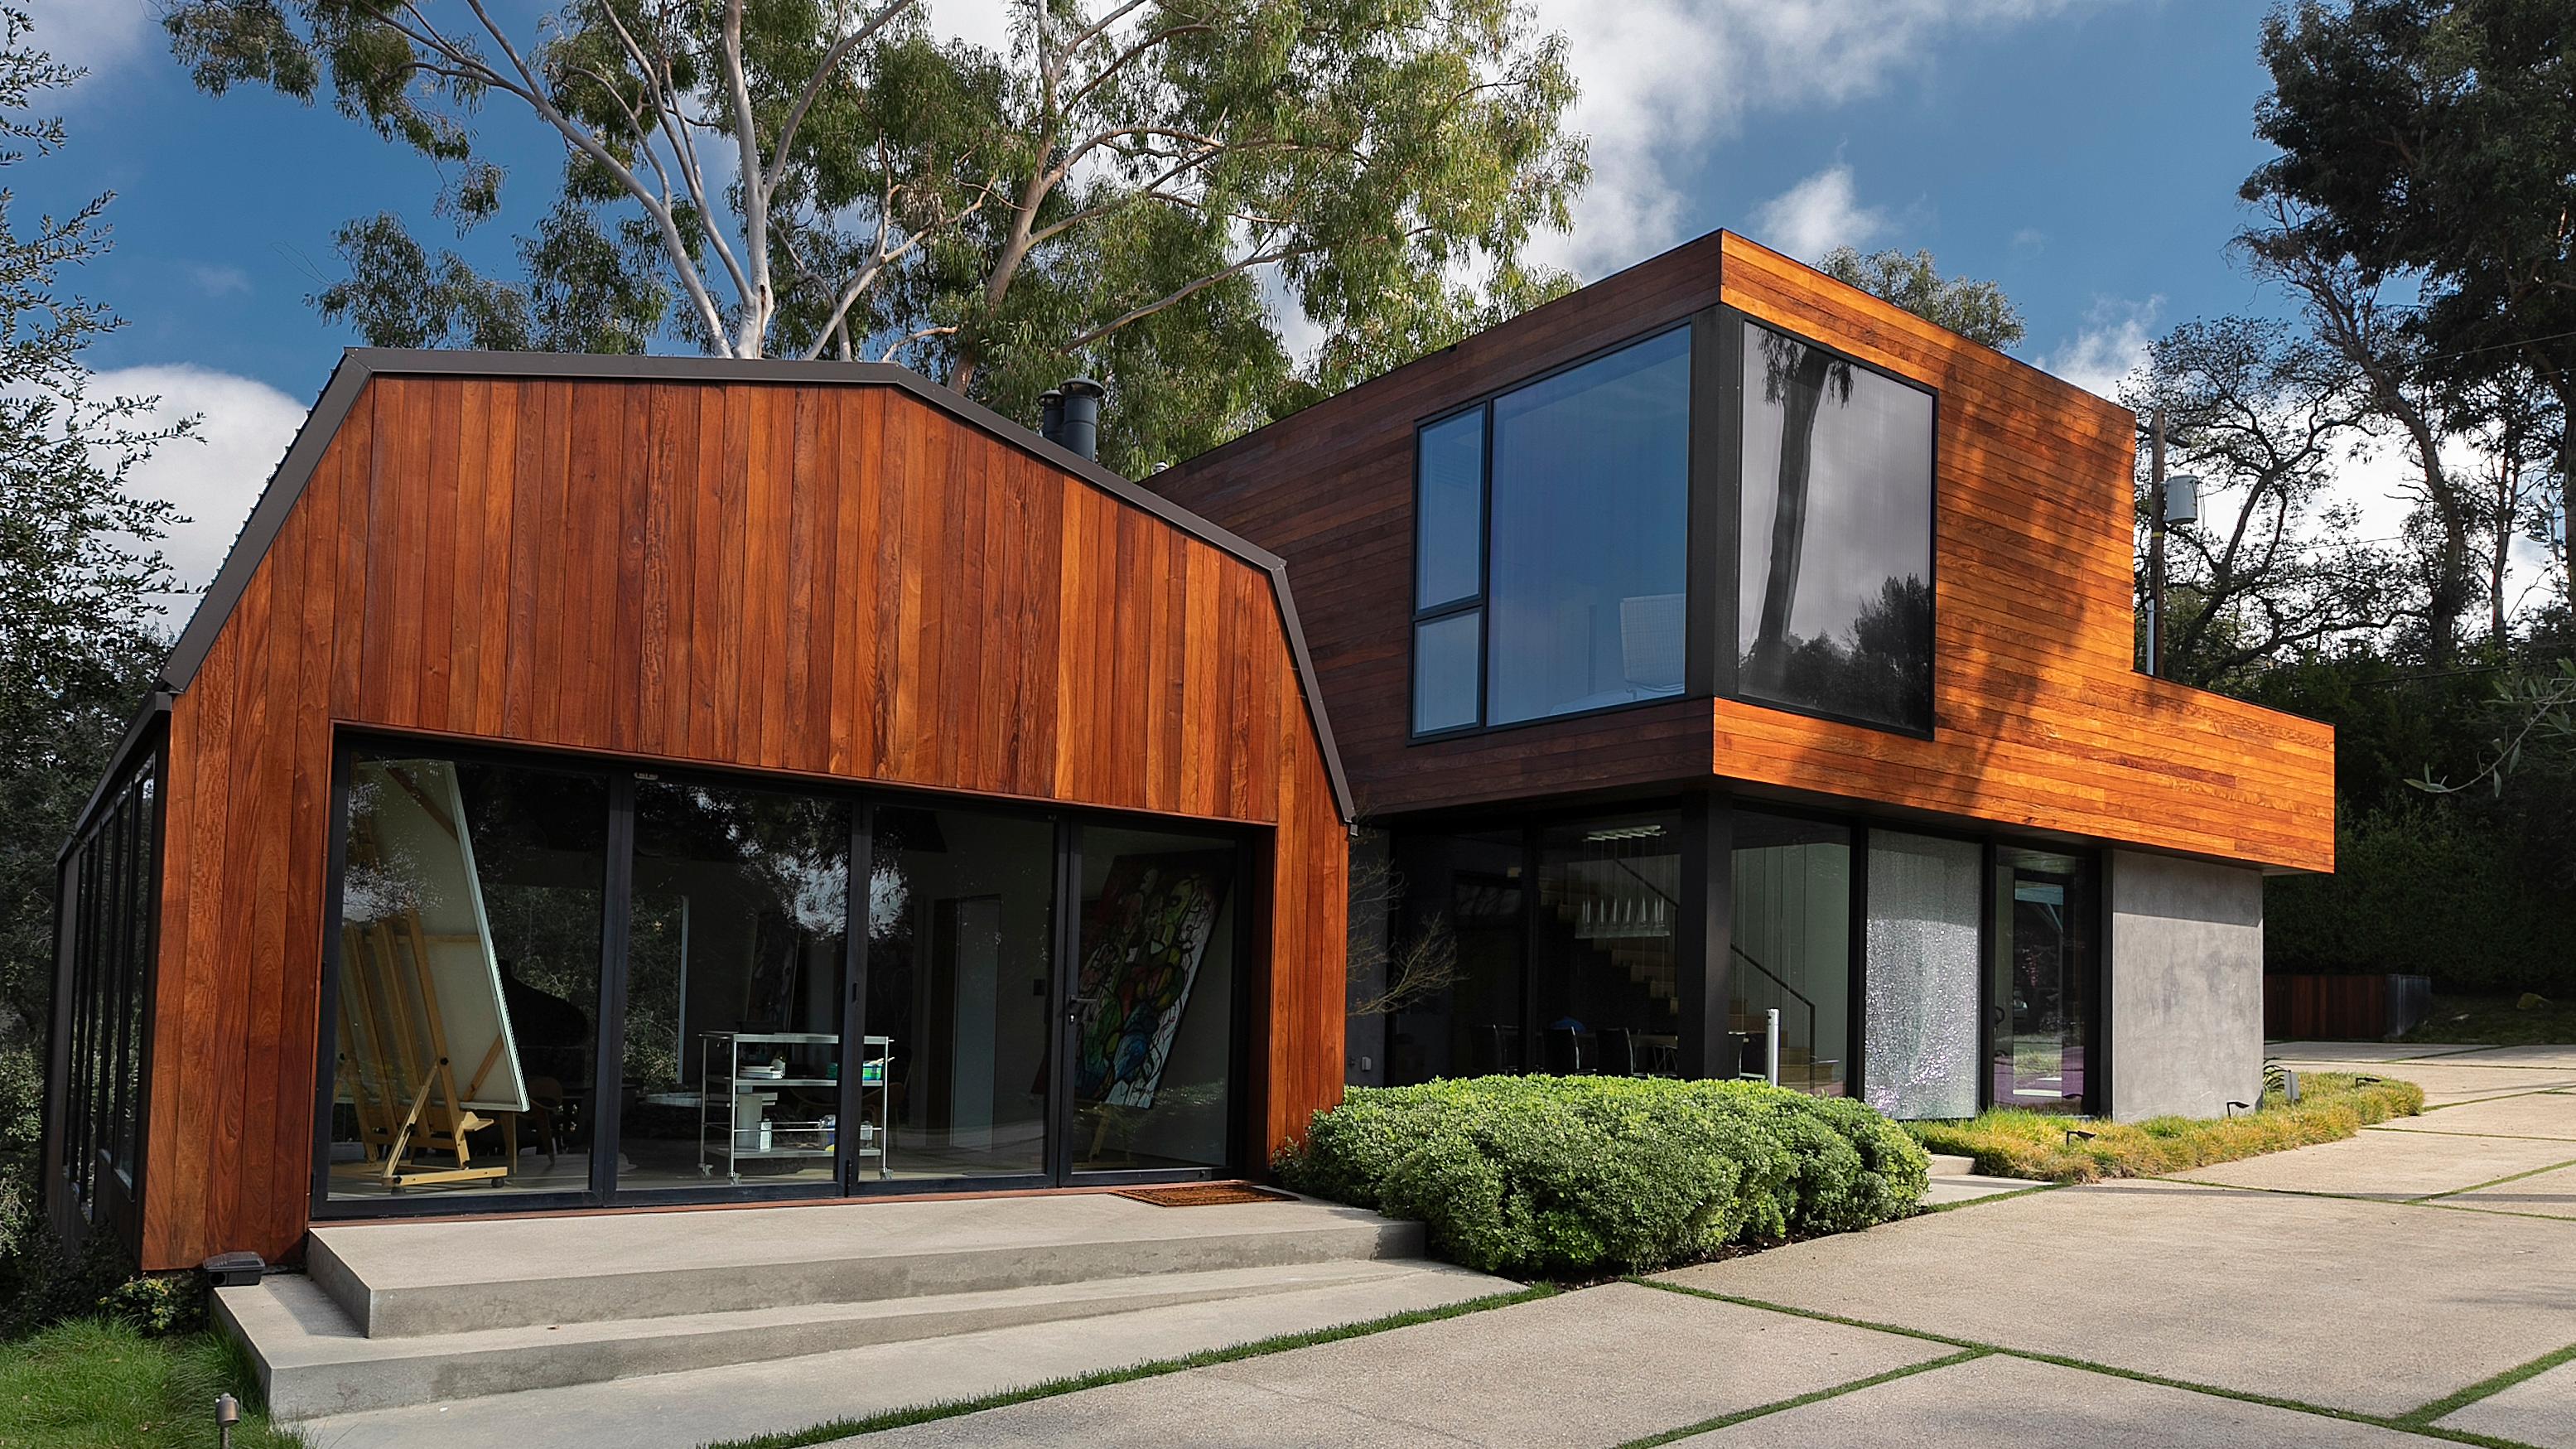 The Oak Pass Guest House